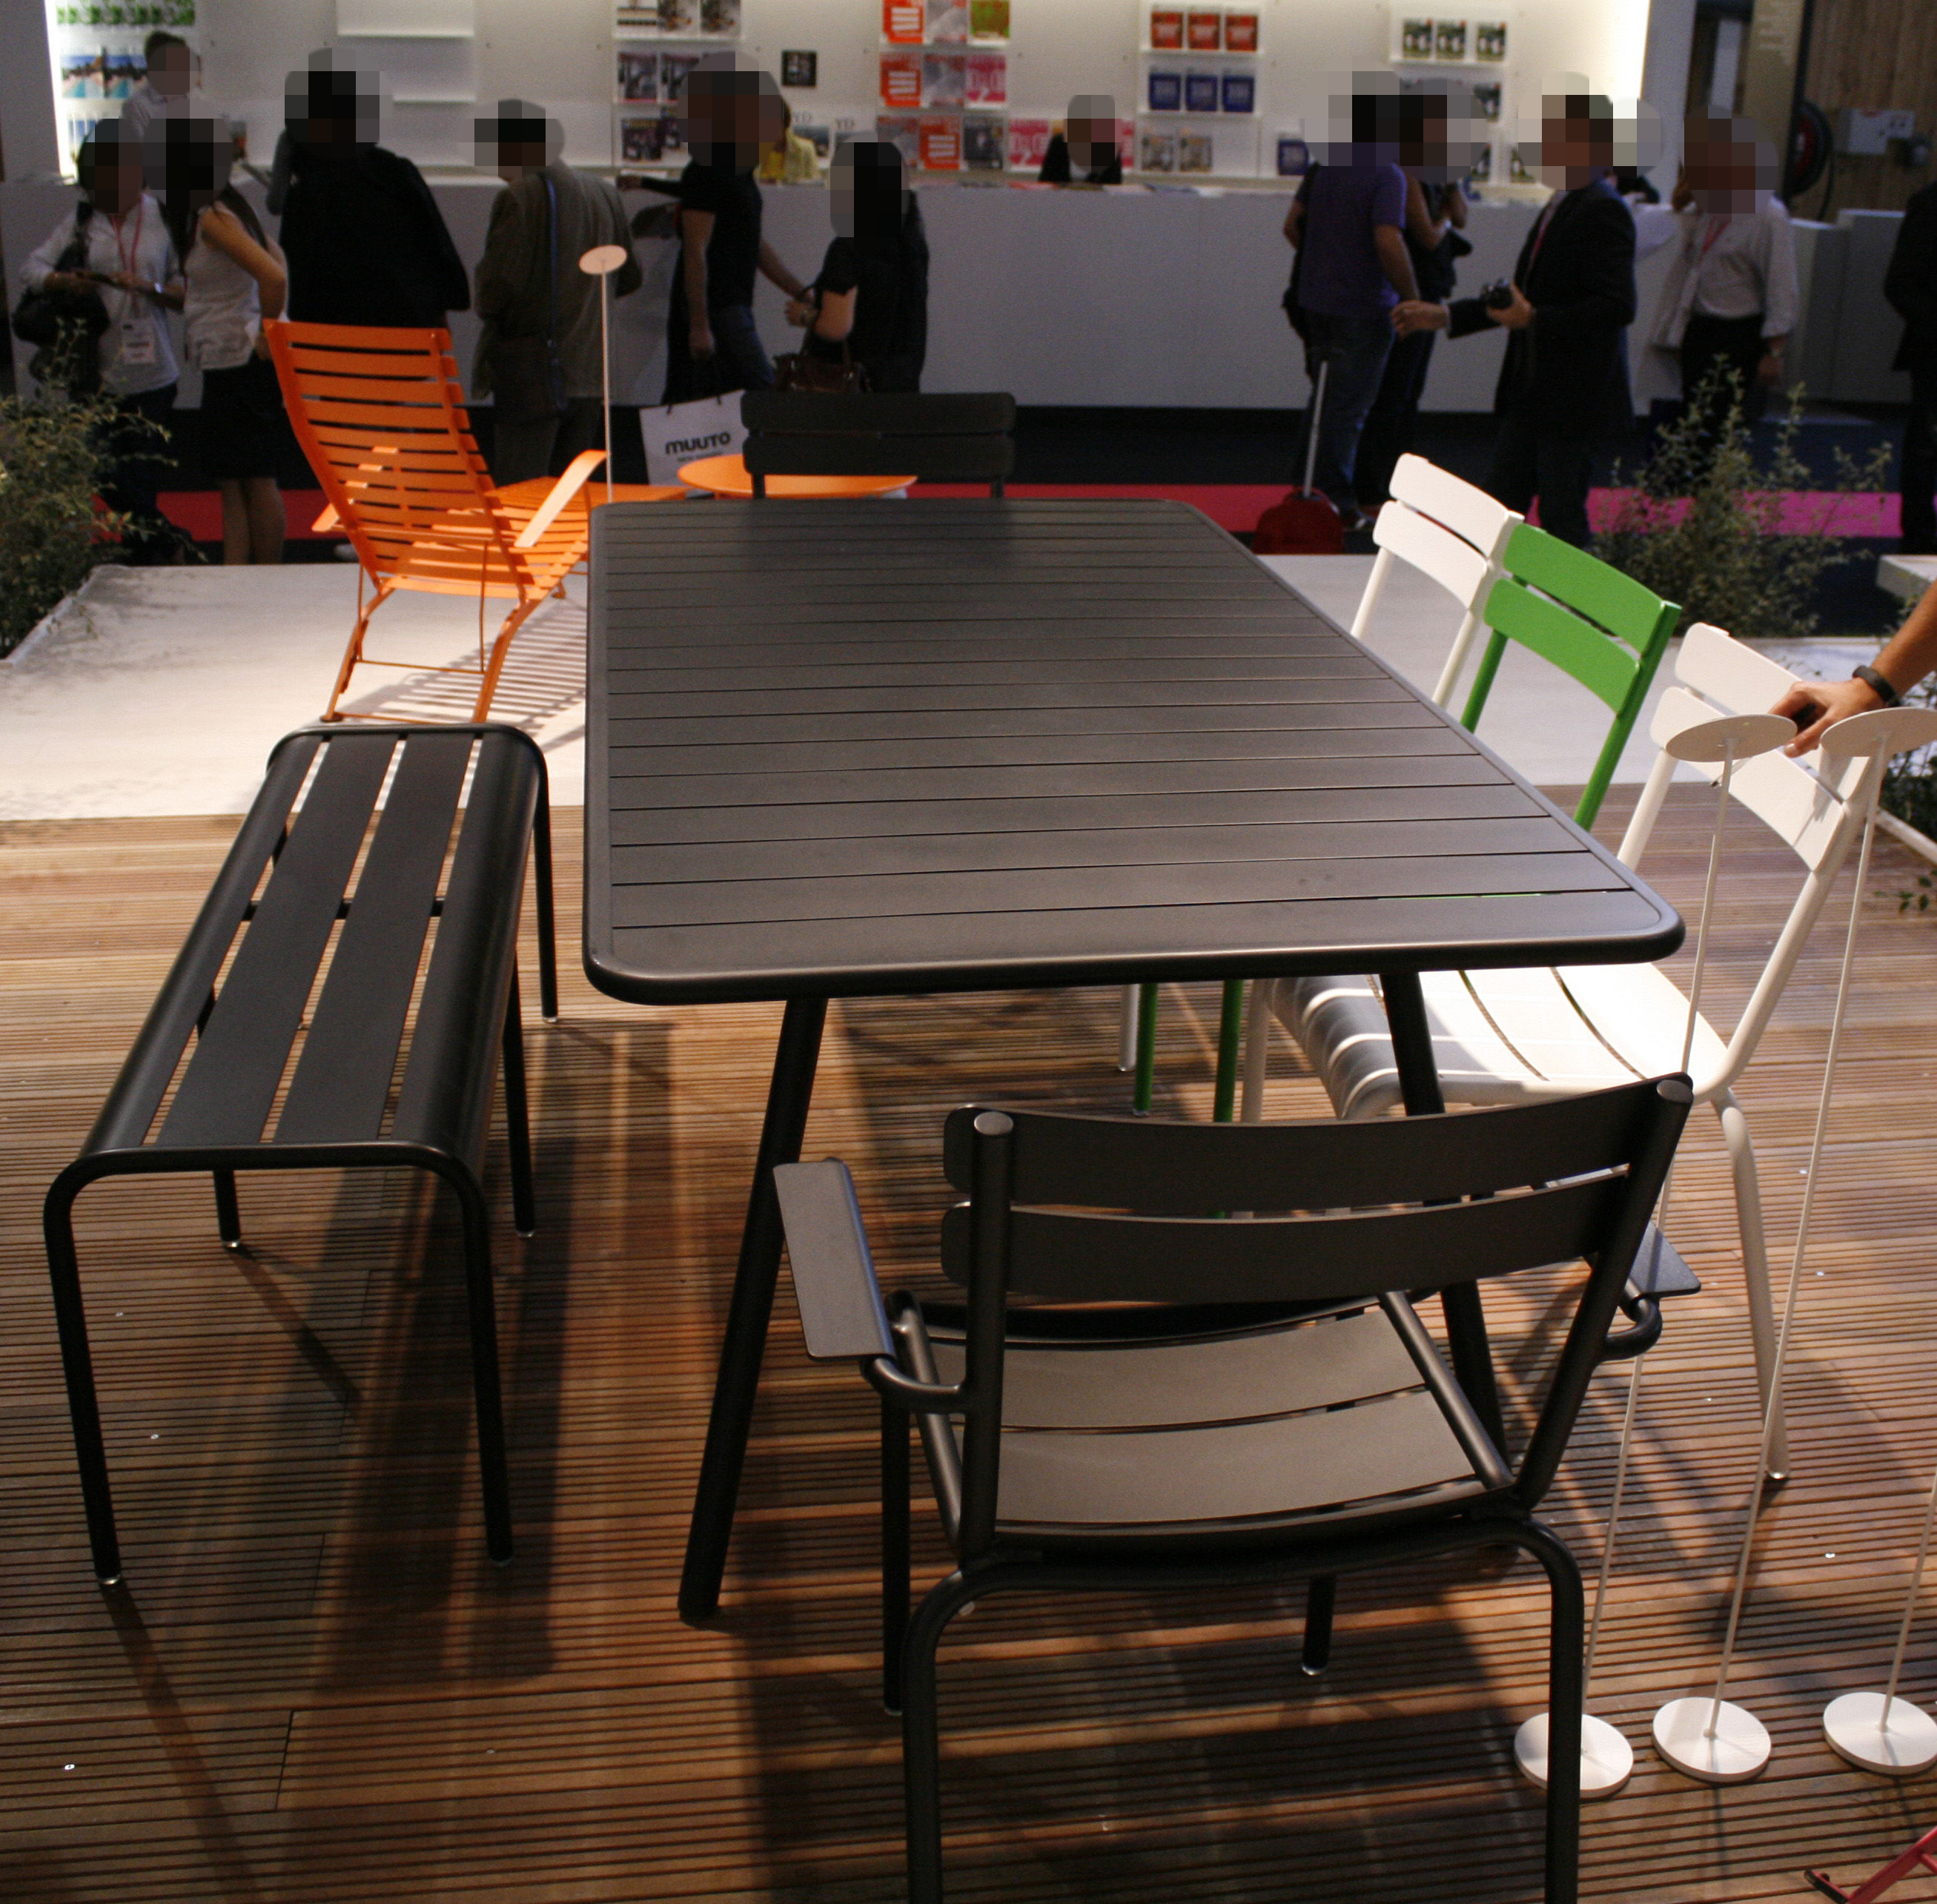 luxembourg rechteckig 8 personen l 207 cm fermob tisch. Black Bedroom Furniture Sets. Home Design Ideas